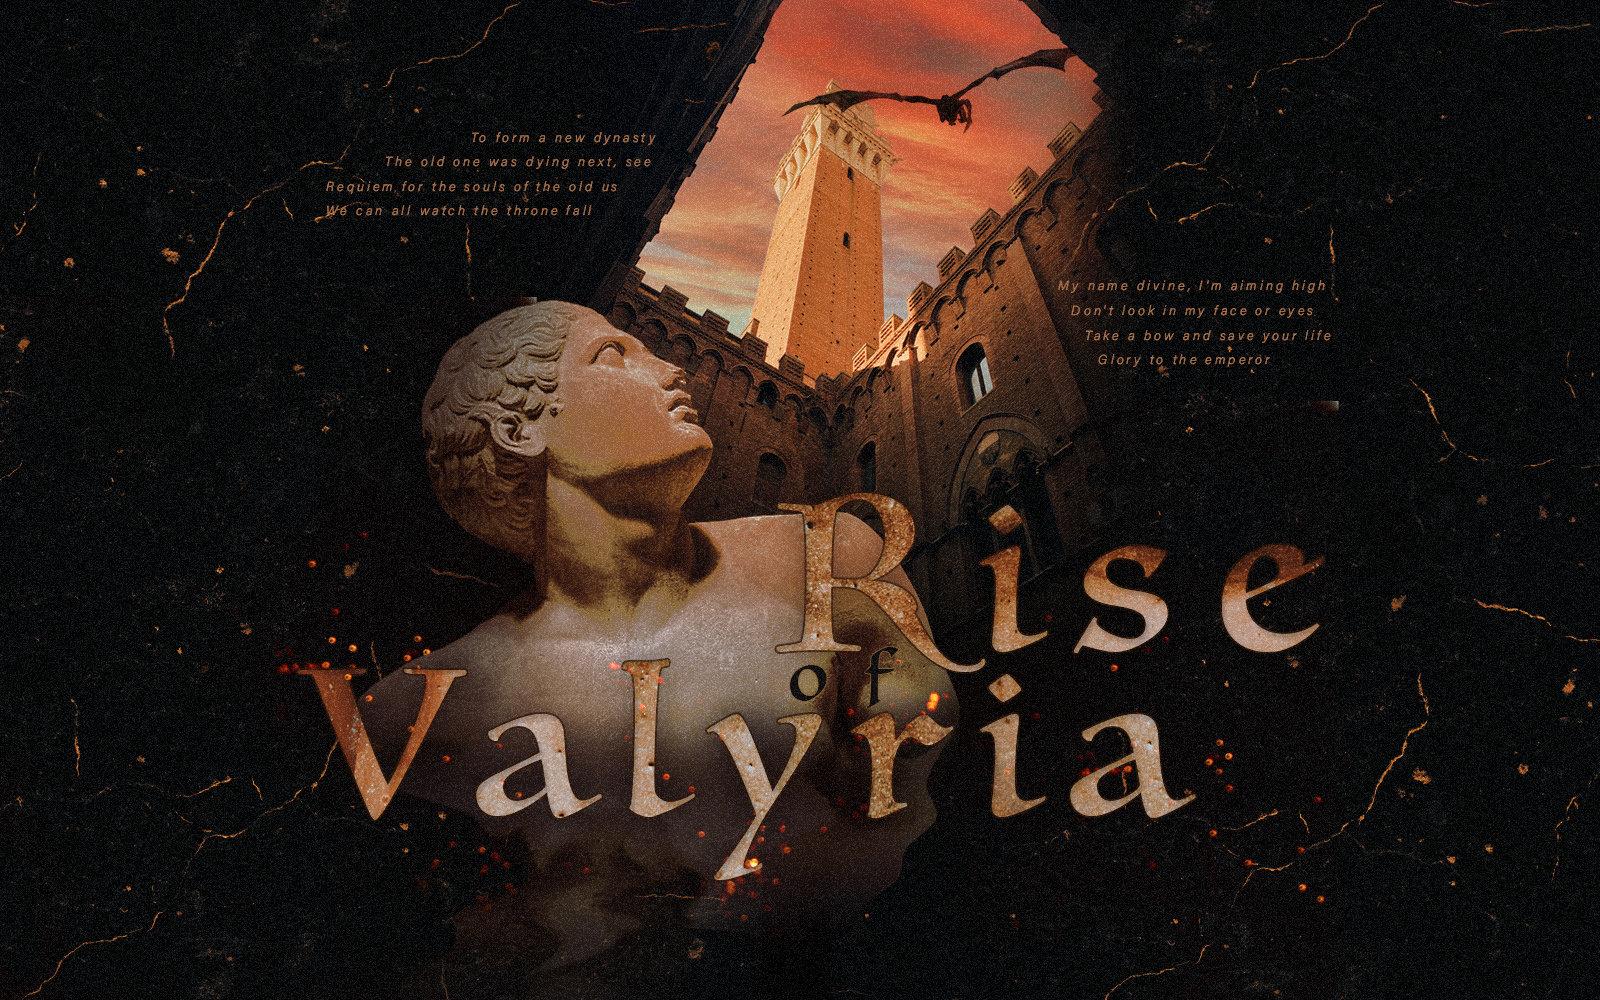 Rise of Valyria - Sīmonagon hen Valyria